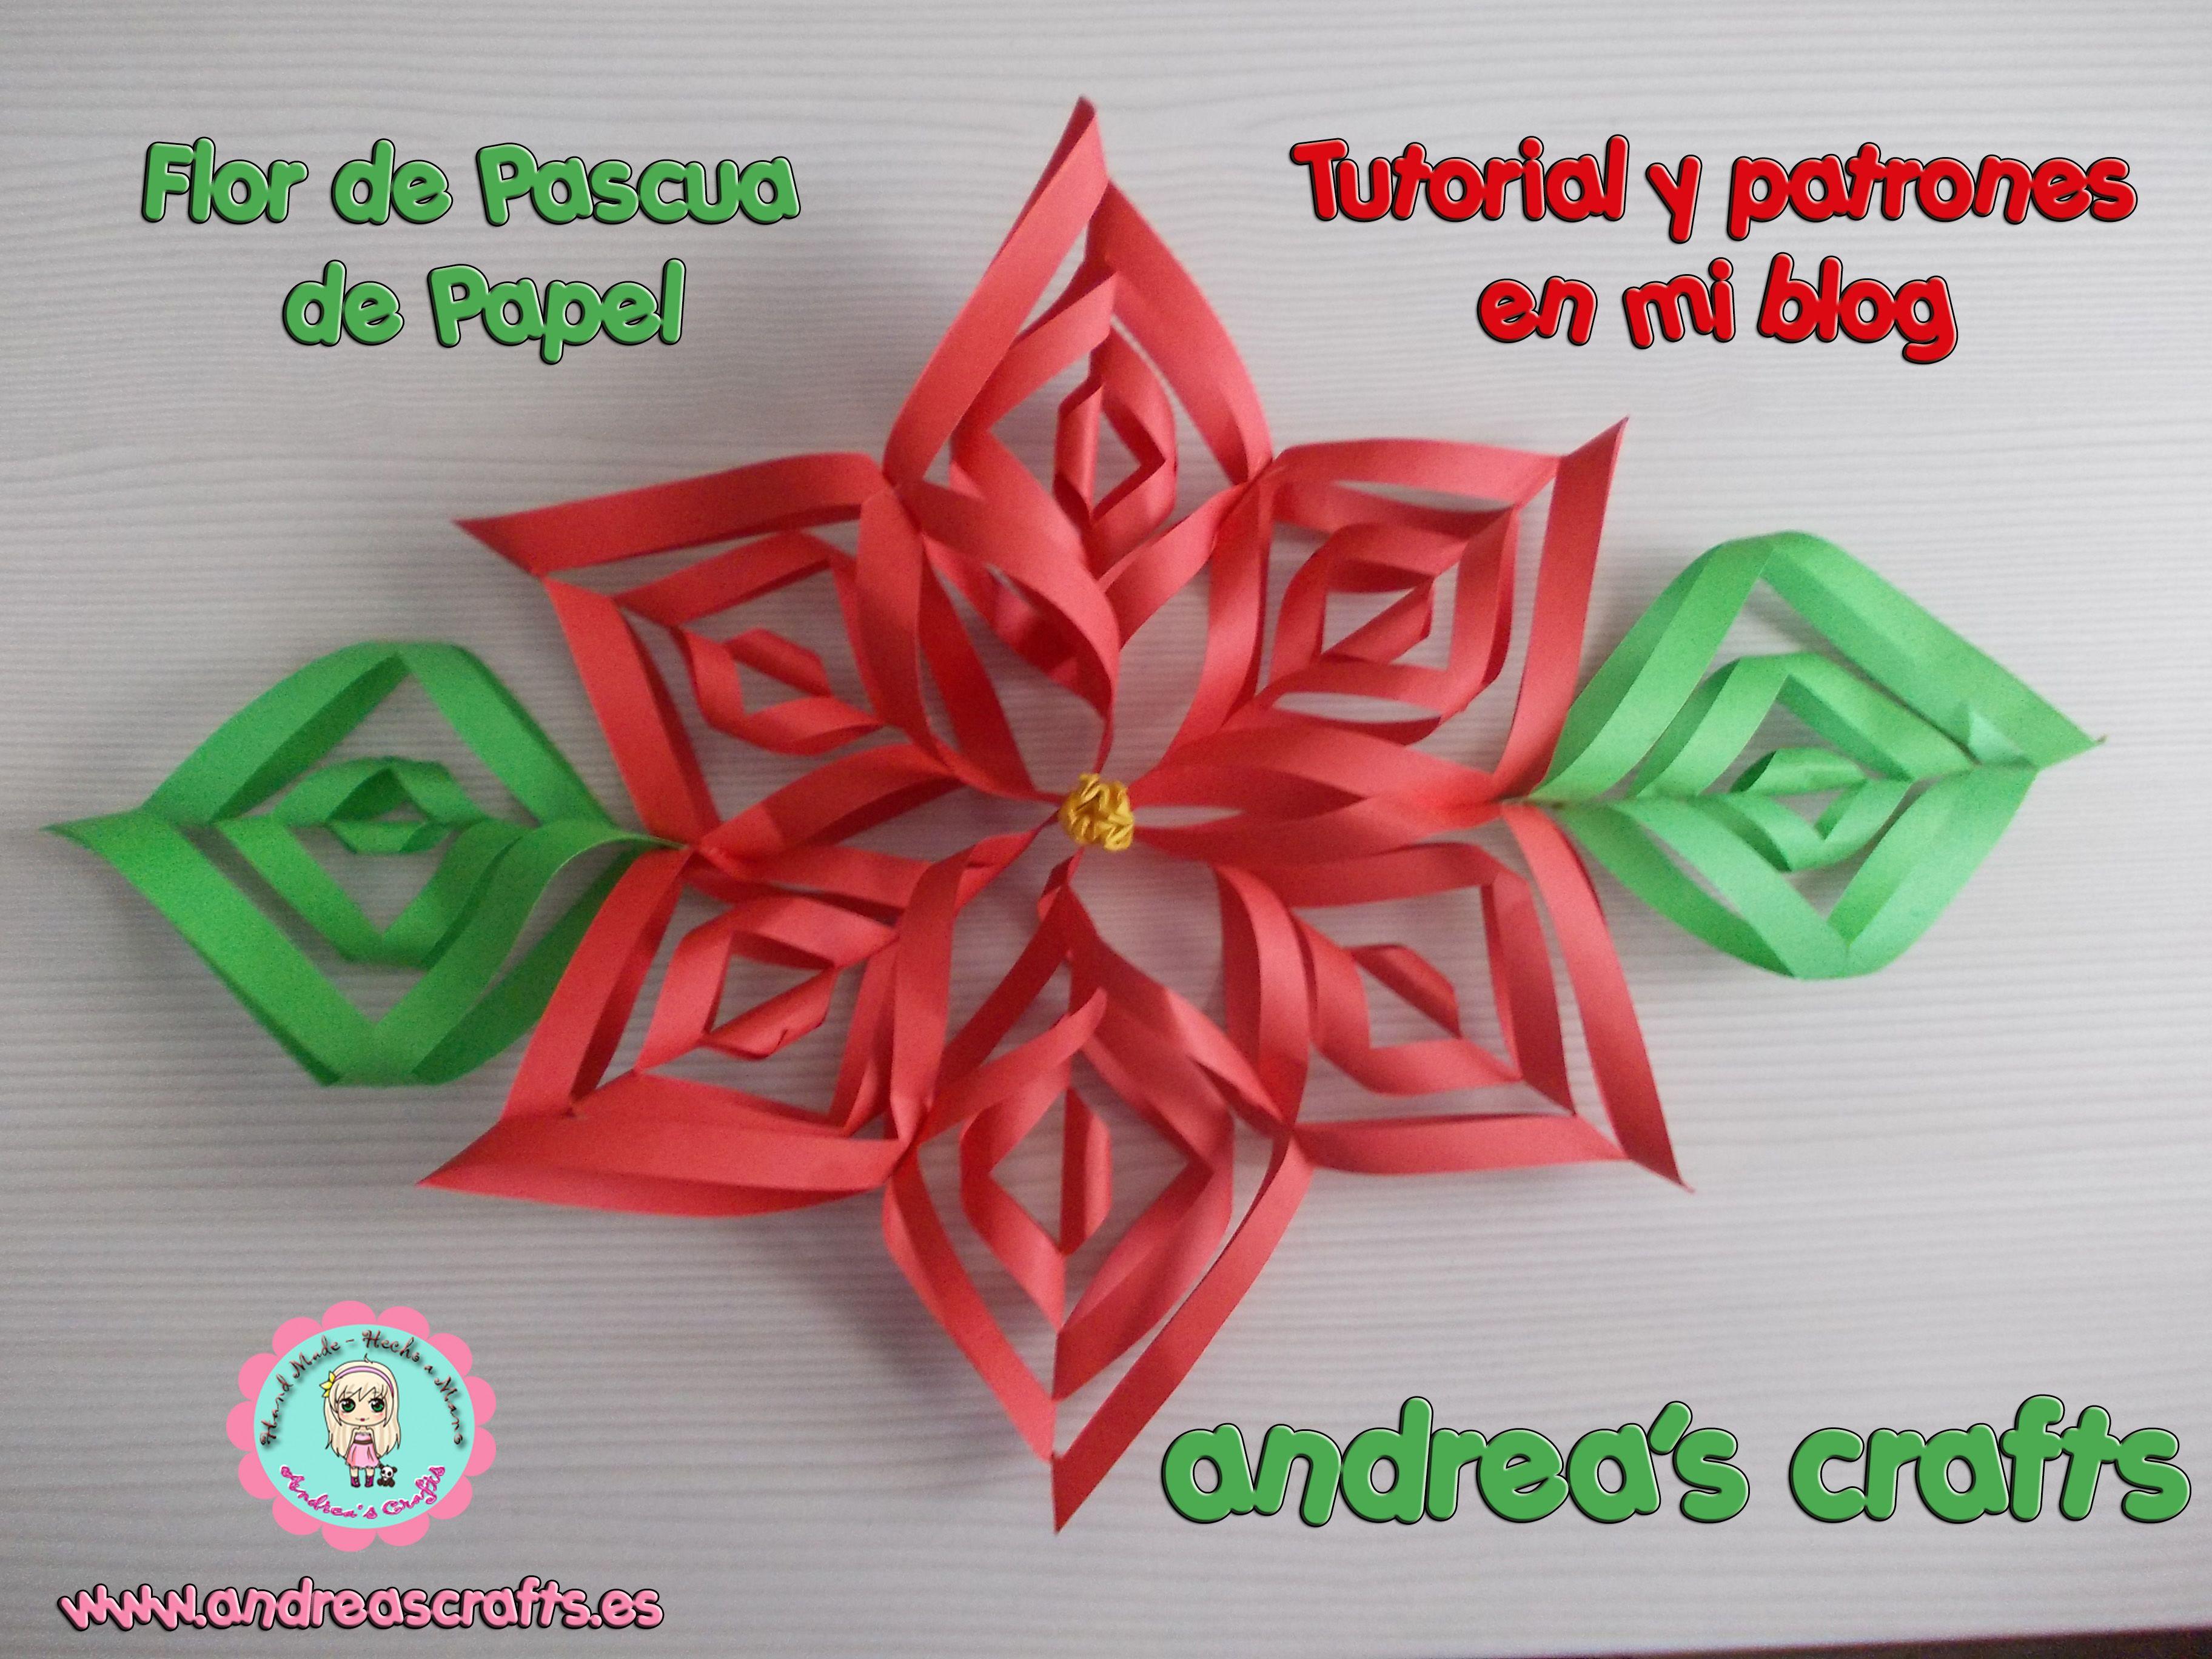 Flor de pascua de papel aprender manualidades es for Manualidades pascua